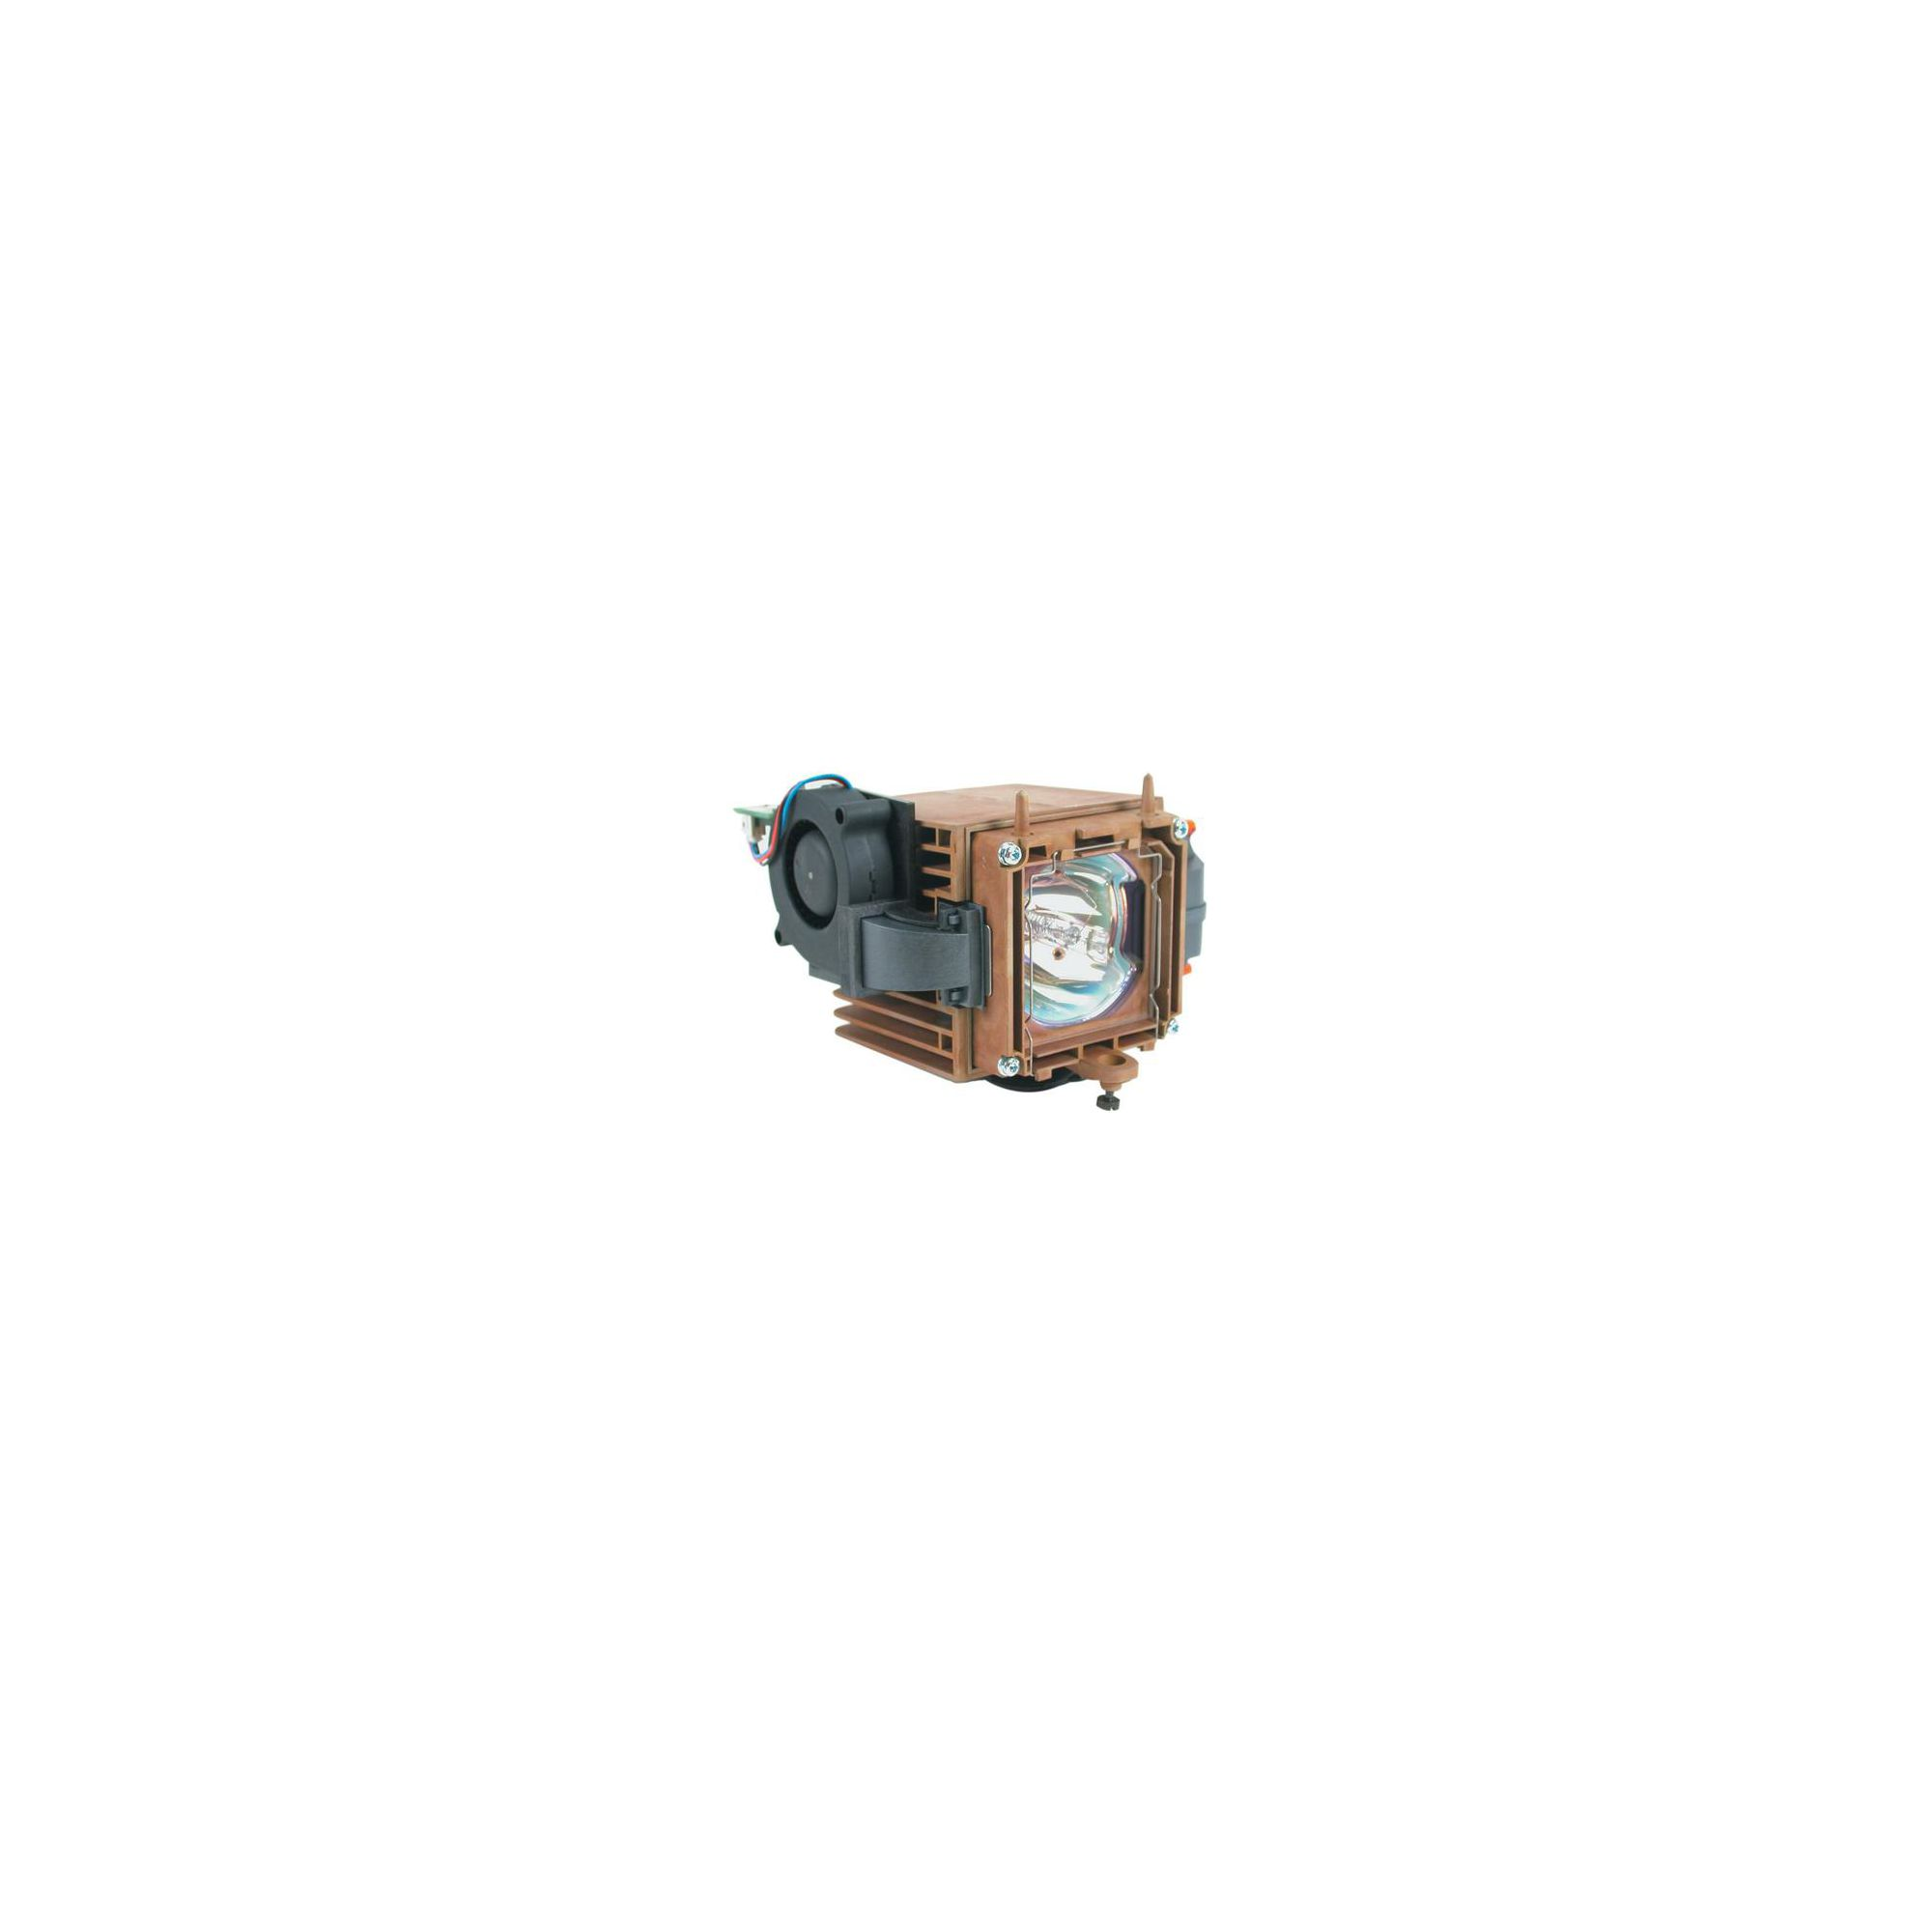 InFocus 006 Replacement Lamp for SP5700,SP7200,SP7205,SP7210,LP650 Projectors at Tesco Direct